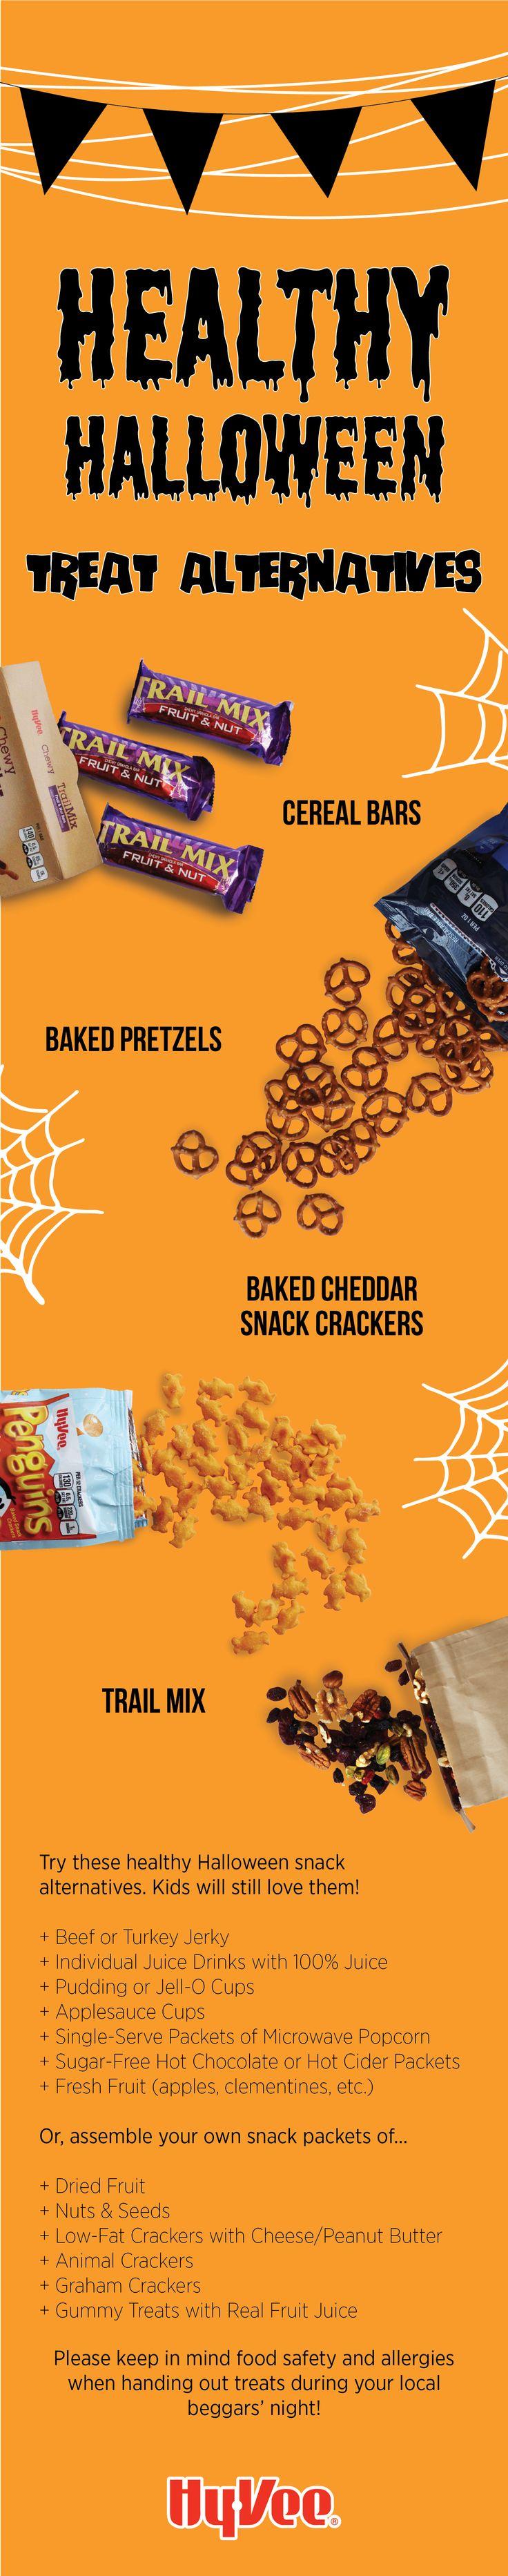 Baked chicken alfredo ziti halloween party foodshealthy